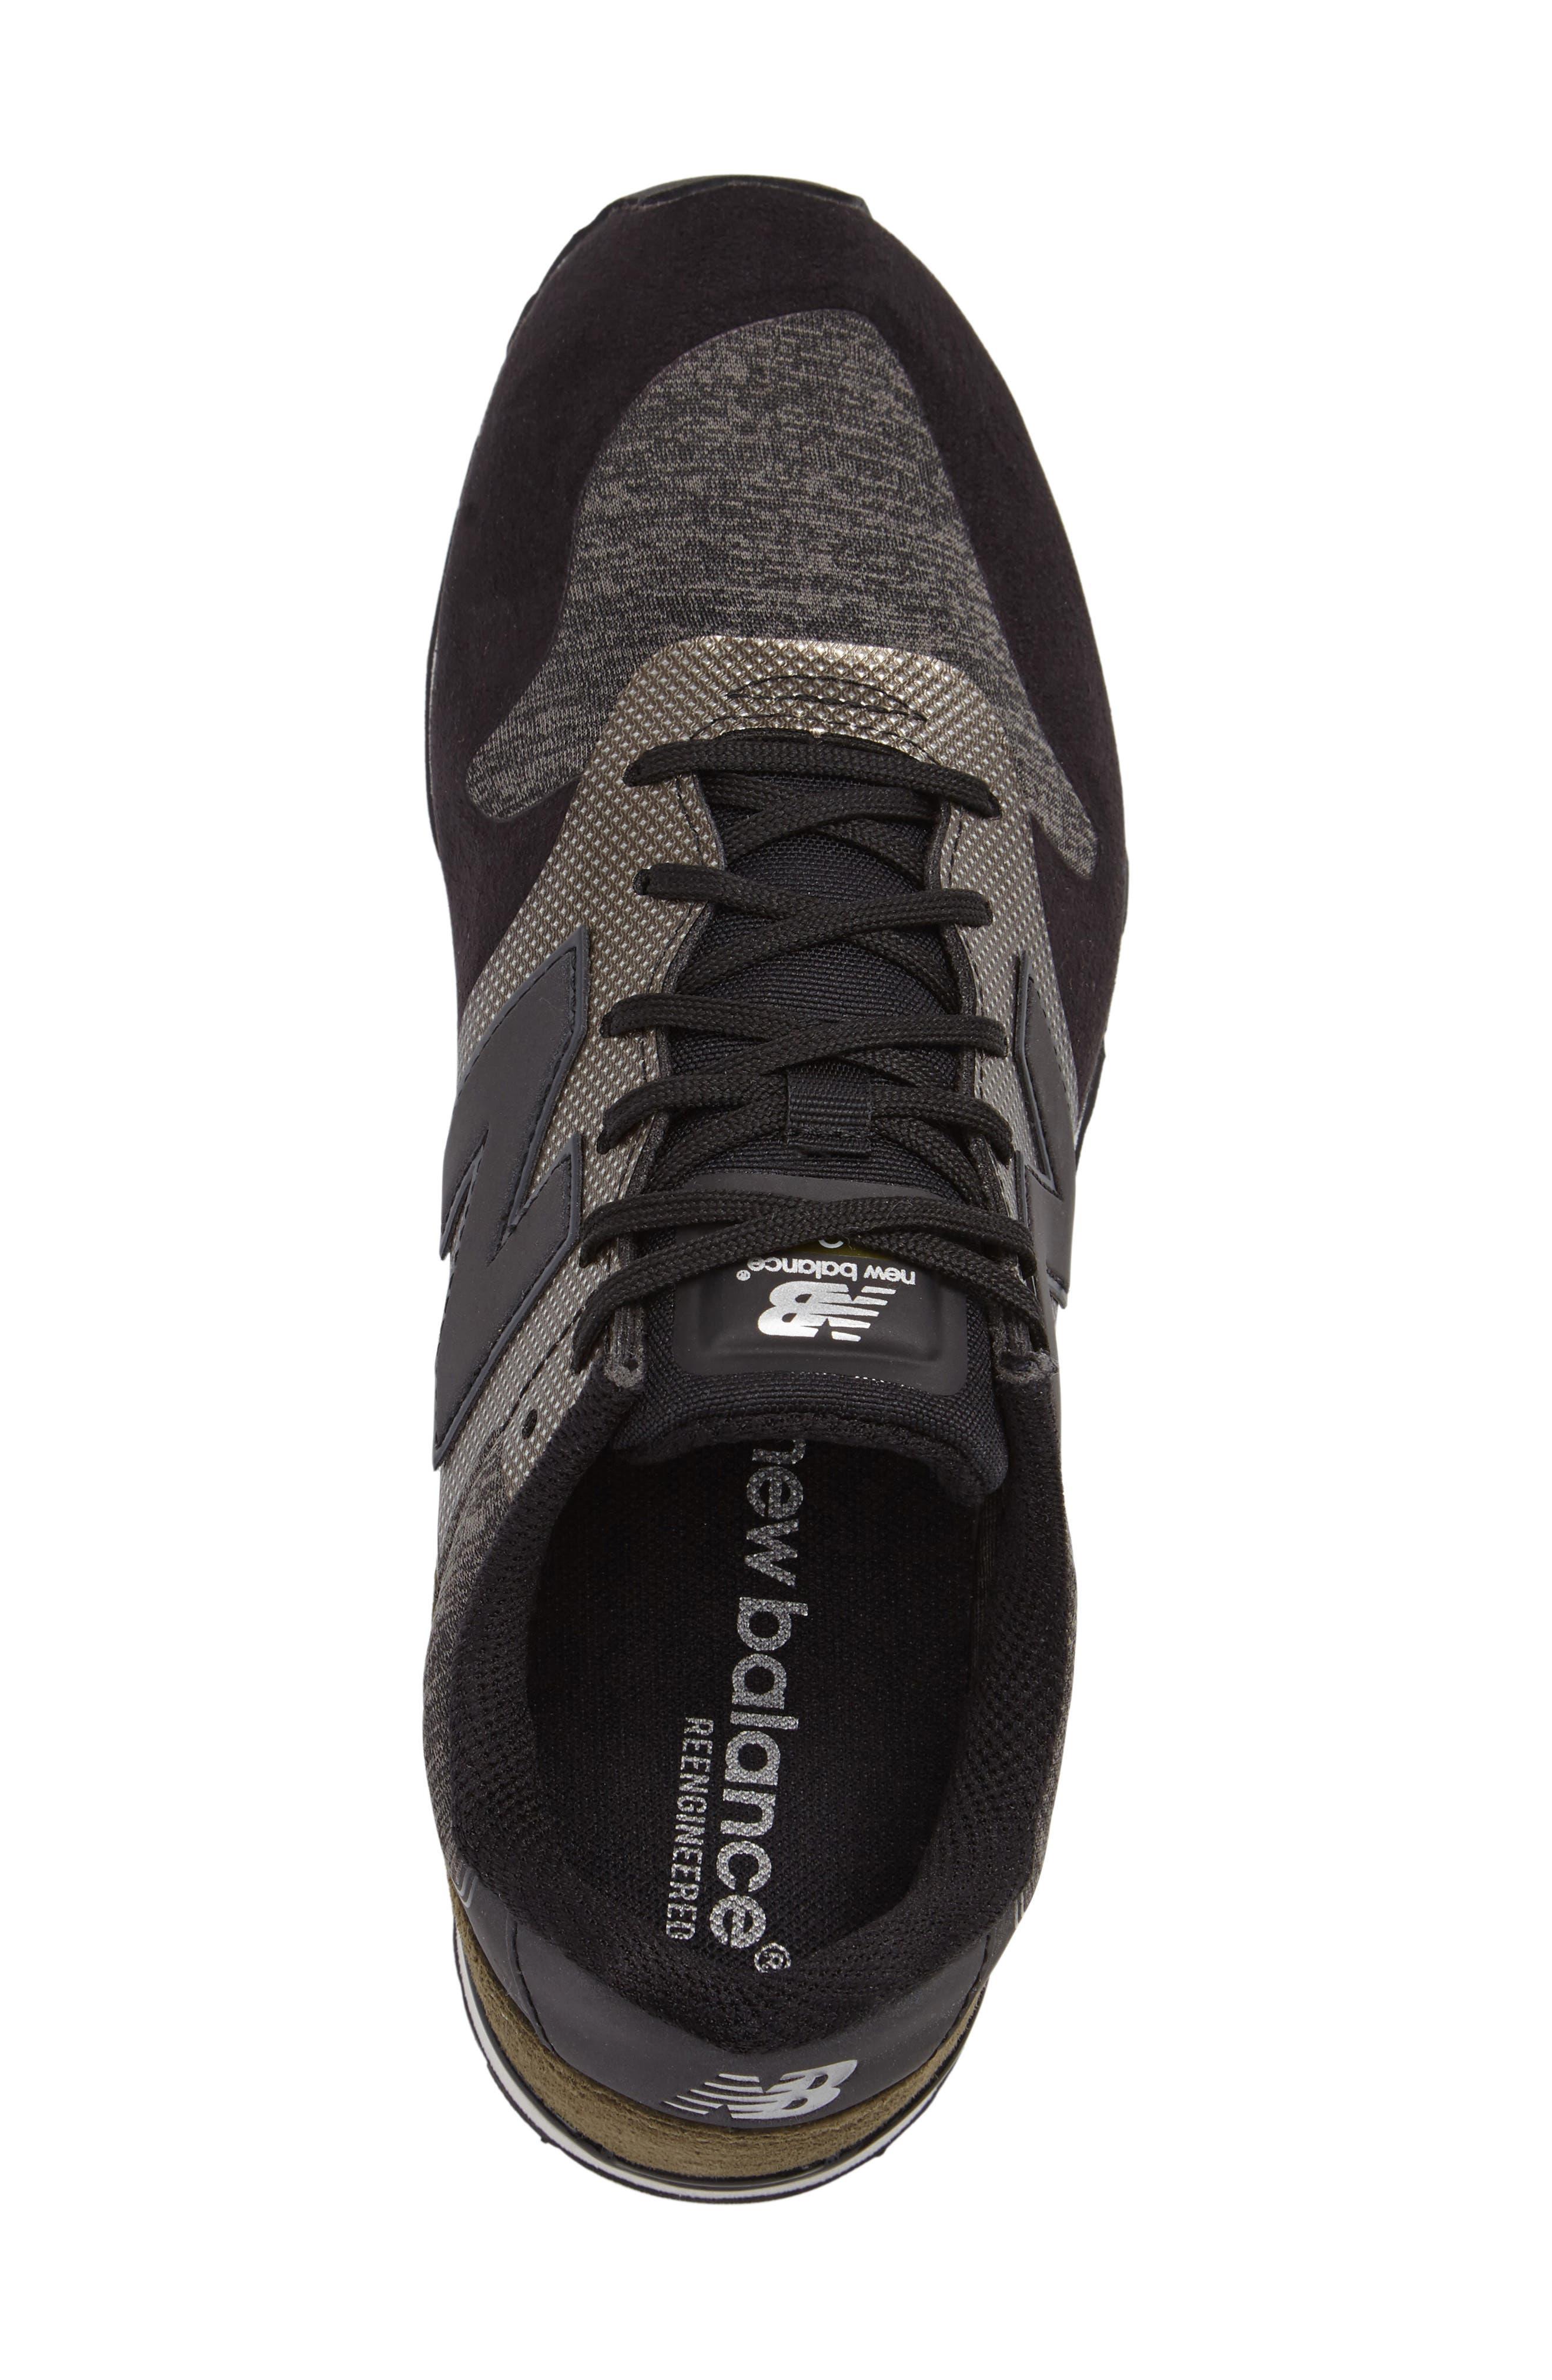 696 Re-Engineered Sneaker,                             Alternate thumbnail 3, color,                             030